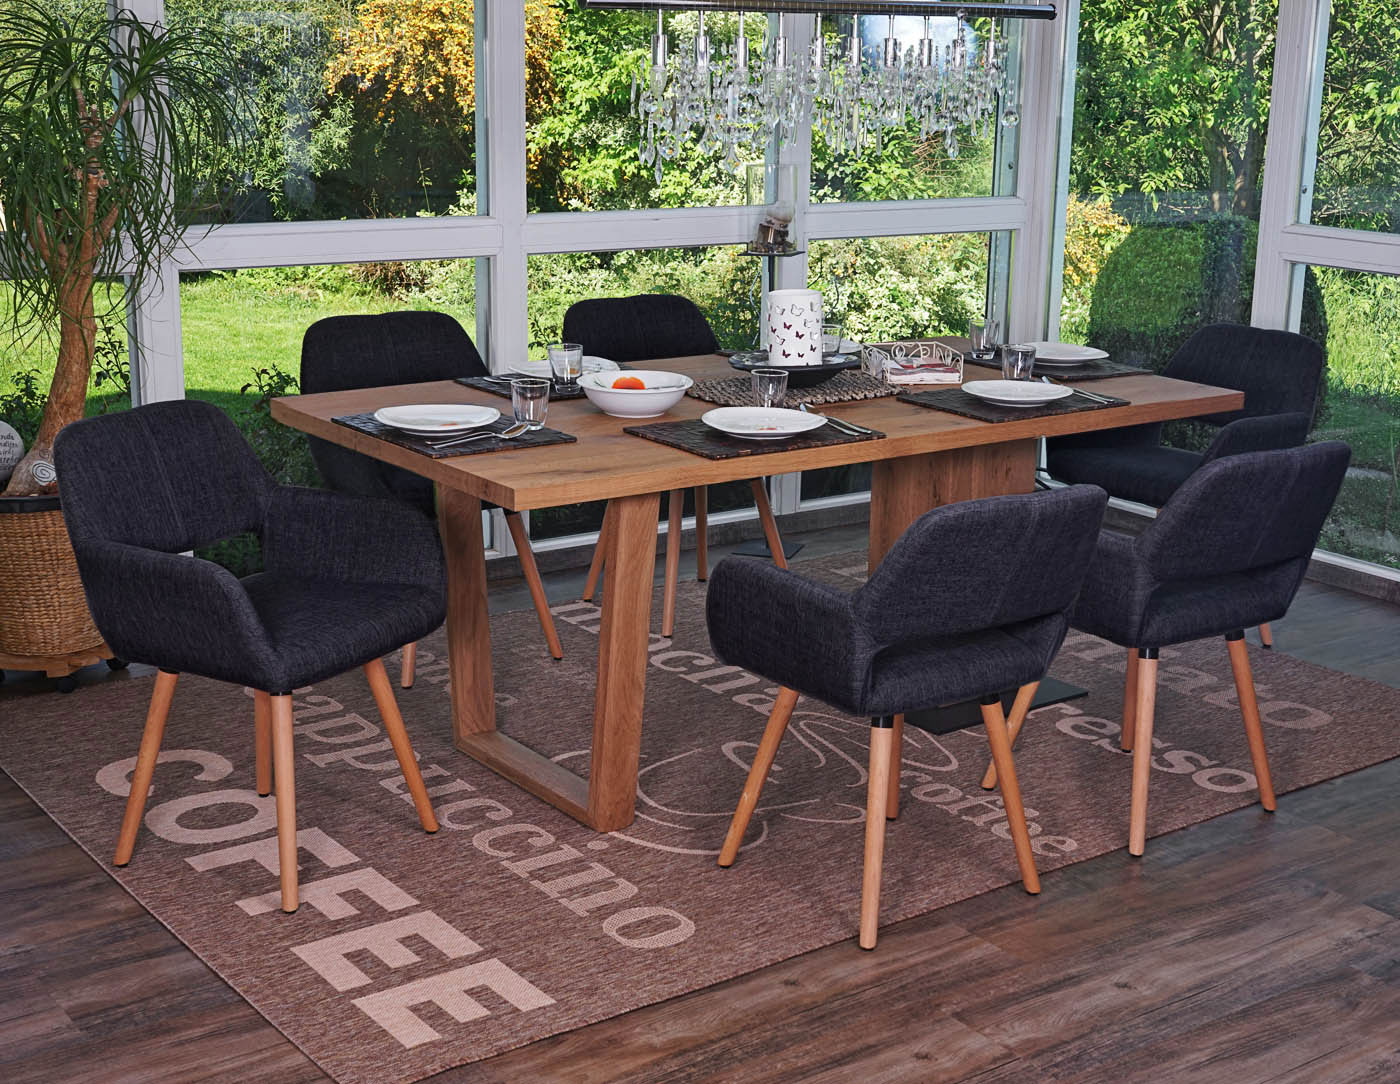 Set 6x sedie sala da pranzo hwc a50 ii design retro legno for Sedie sala pranzo